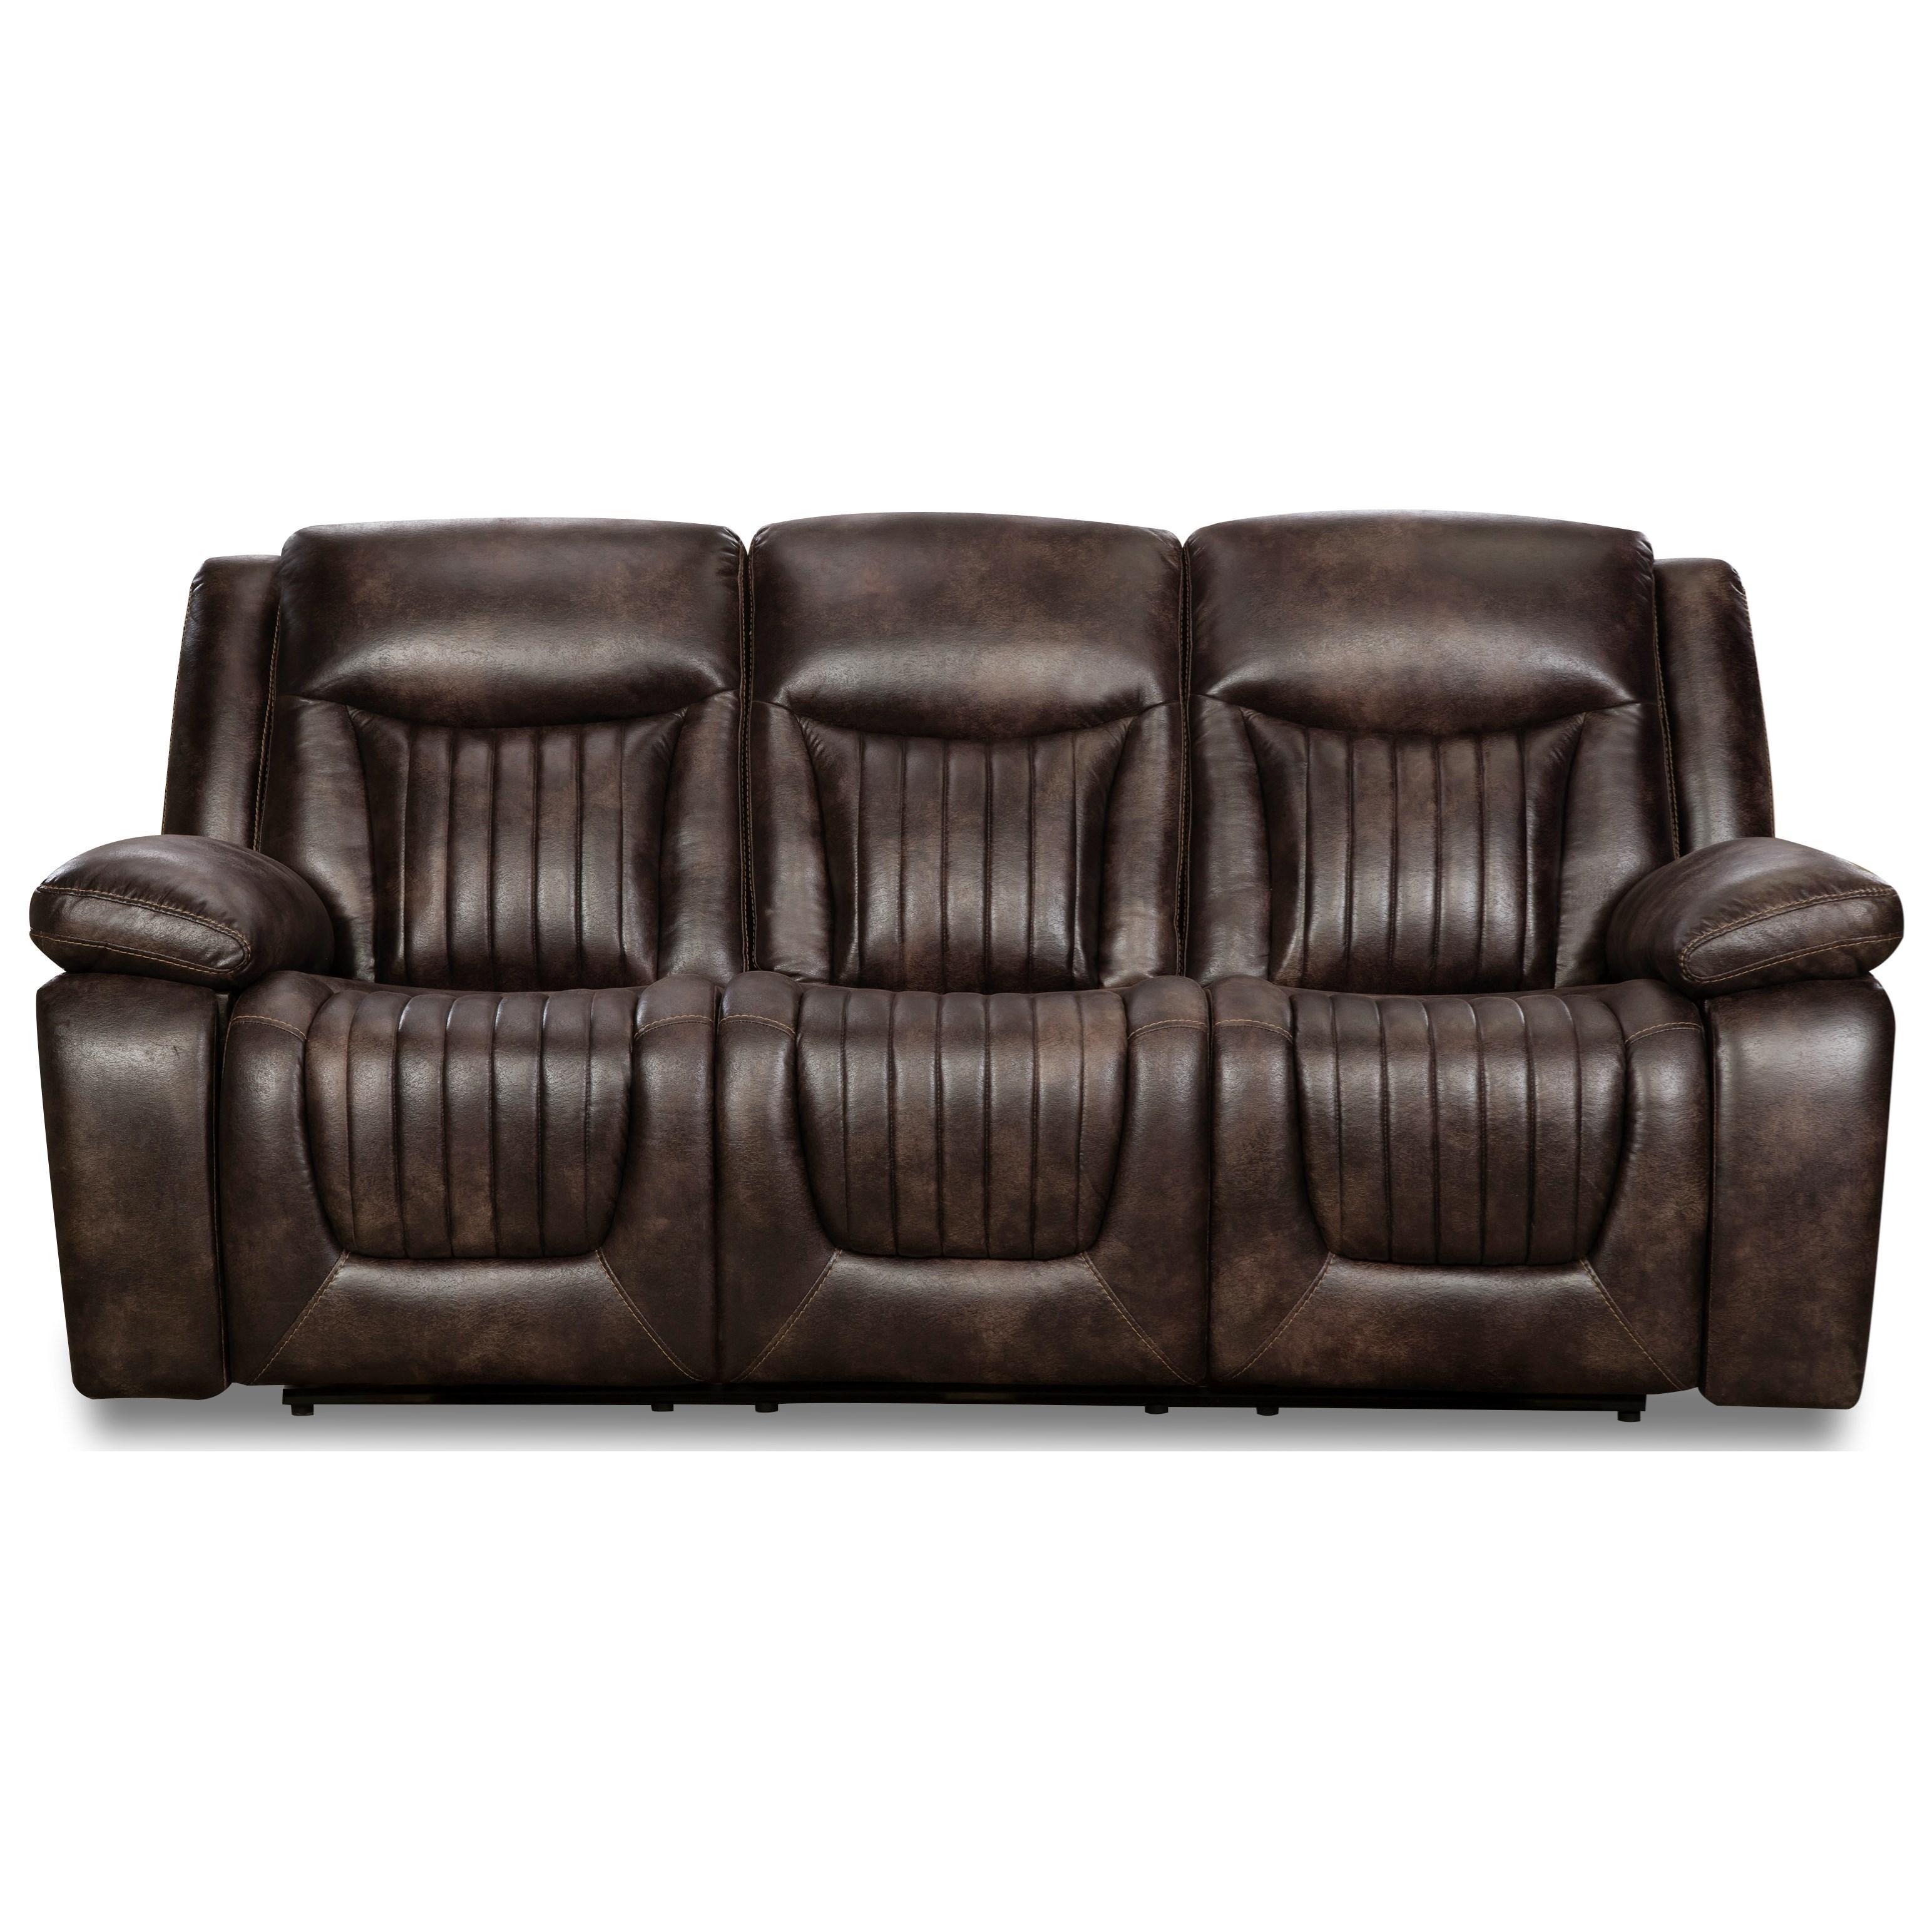 77701 Power Headrest Sofa with Drop Table by Corinthian at Furniture Fair - North Carolina